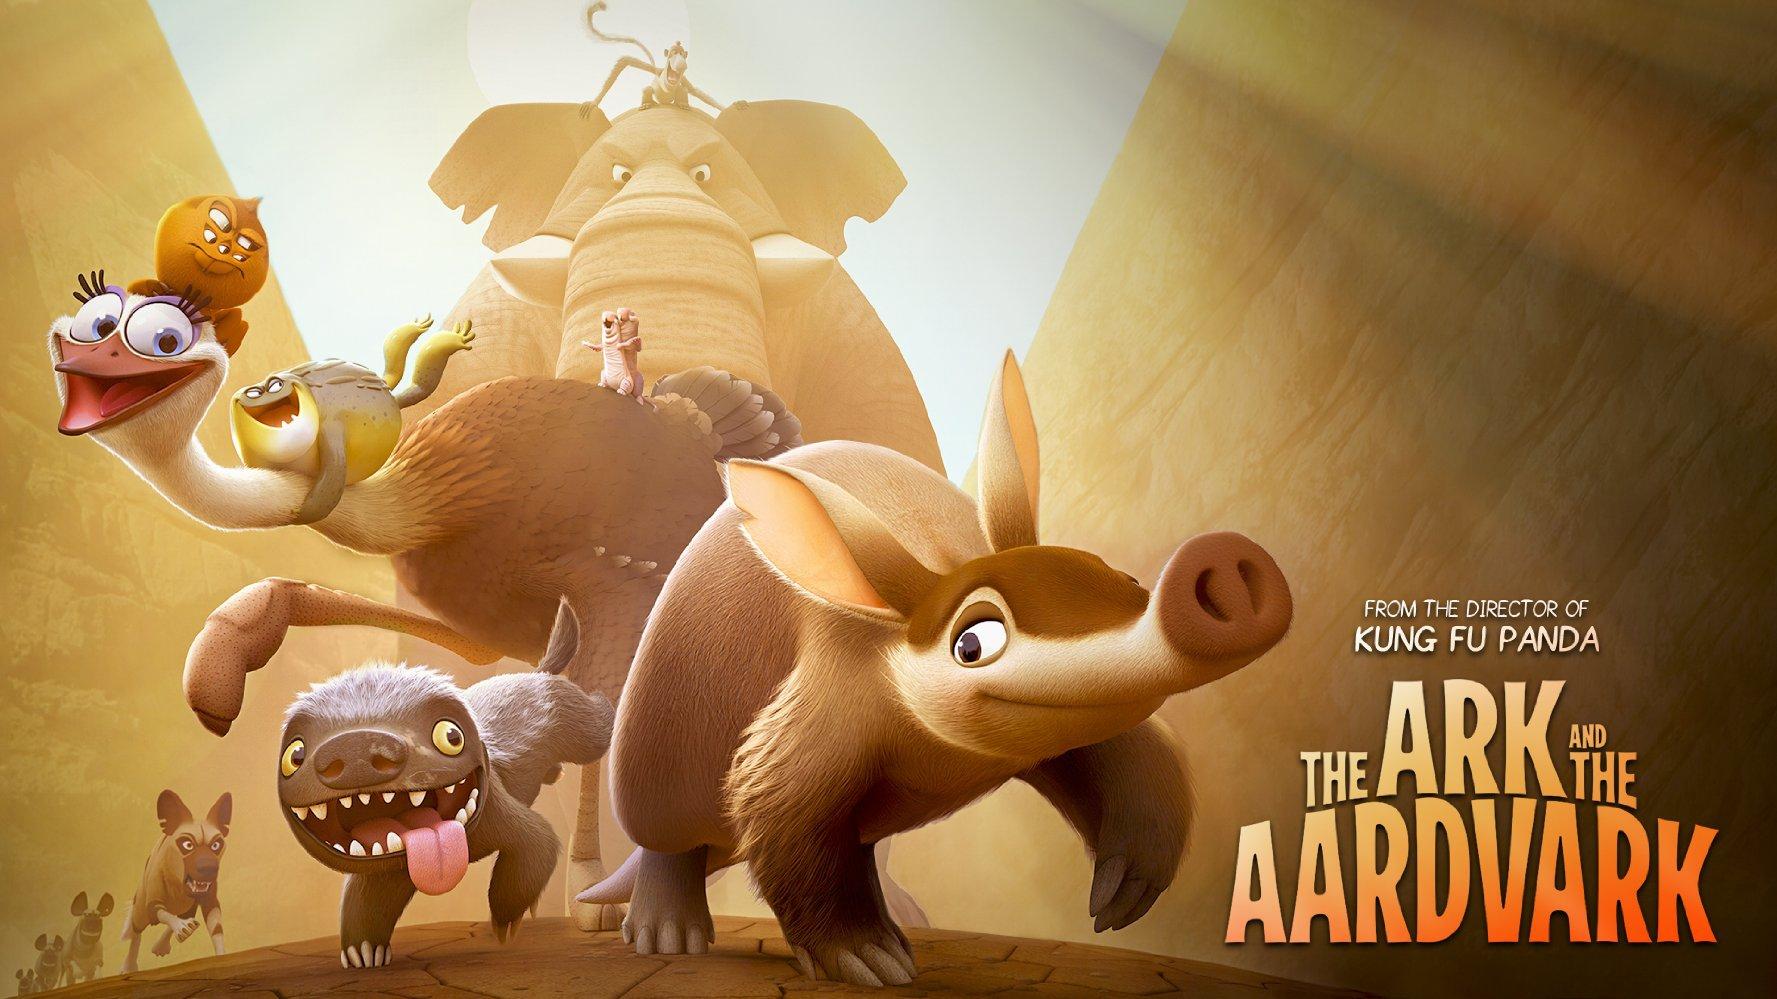 Смотреть трейлер The Ark and the Aardvark (2017)